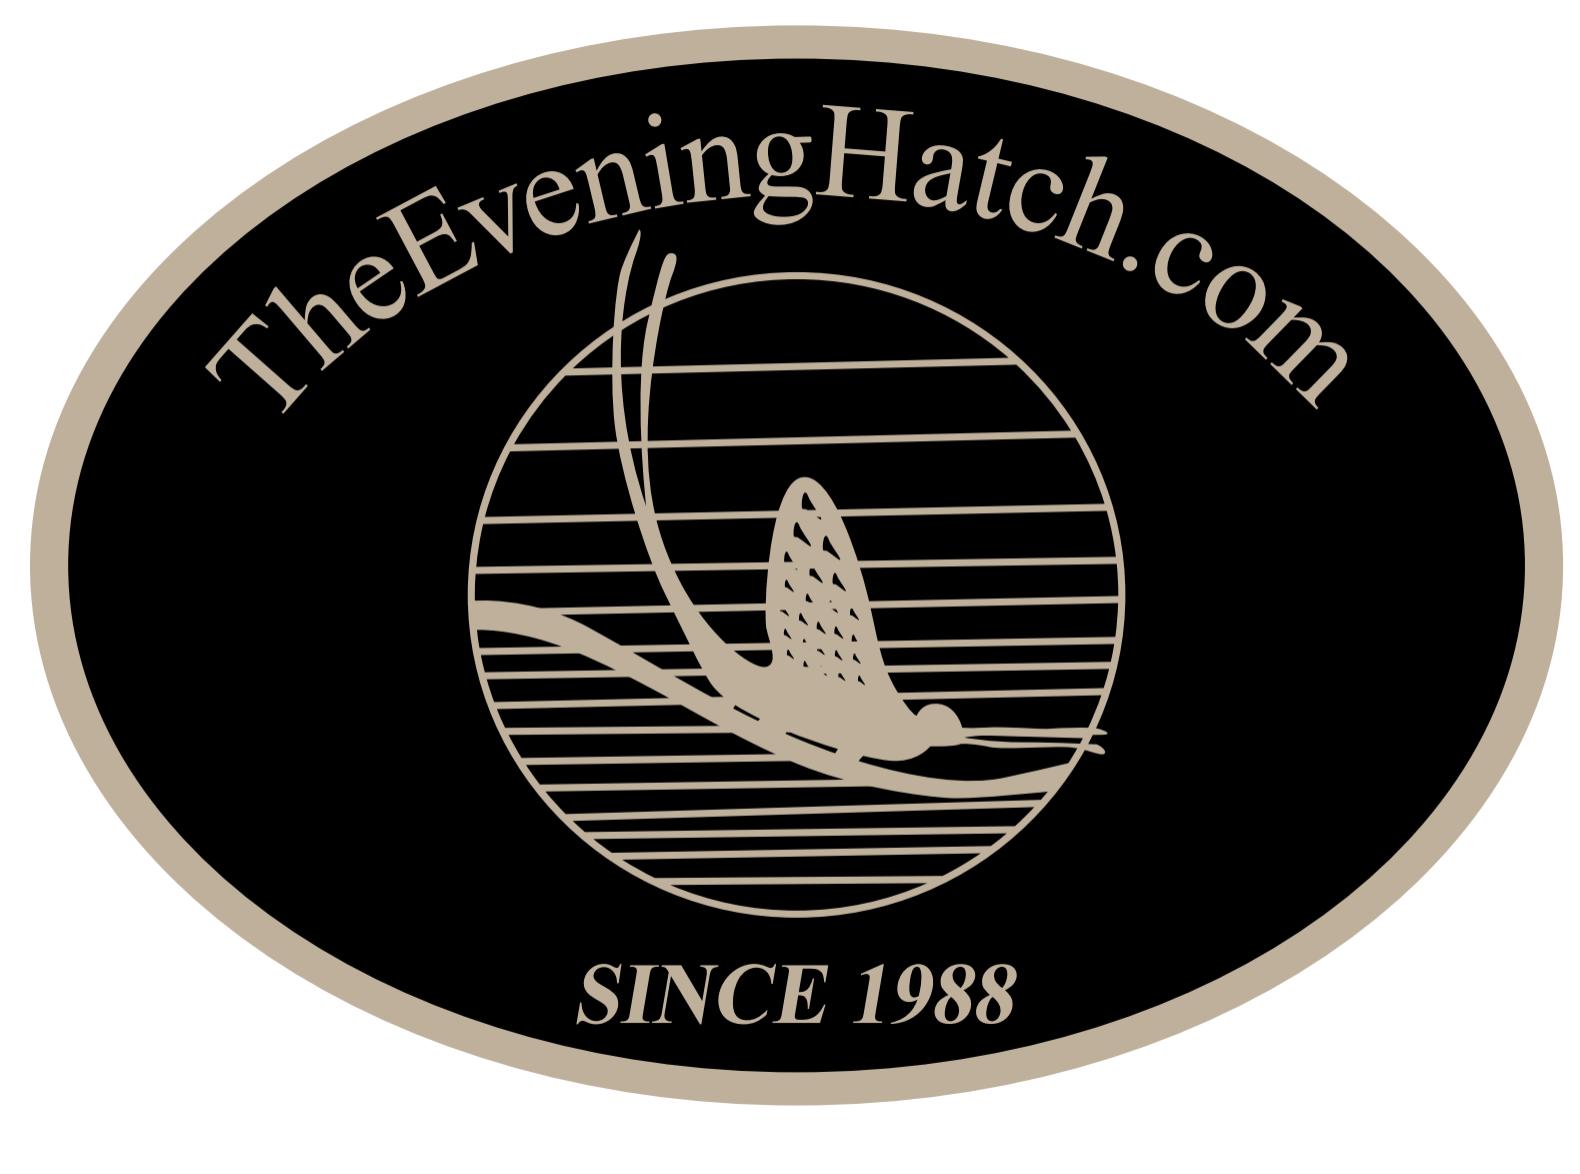 the evening hatch